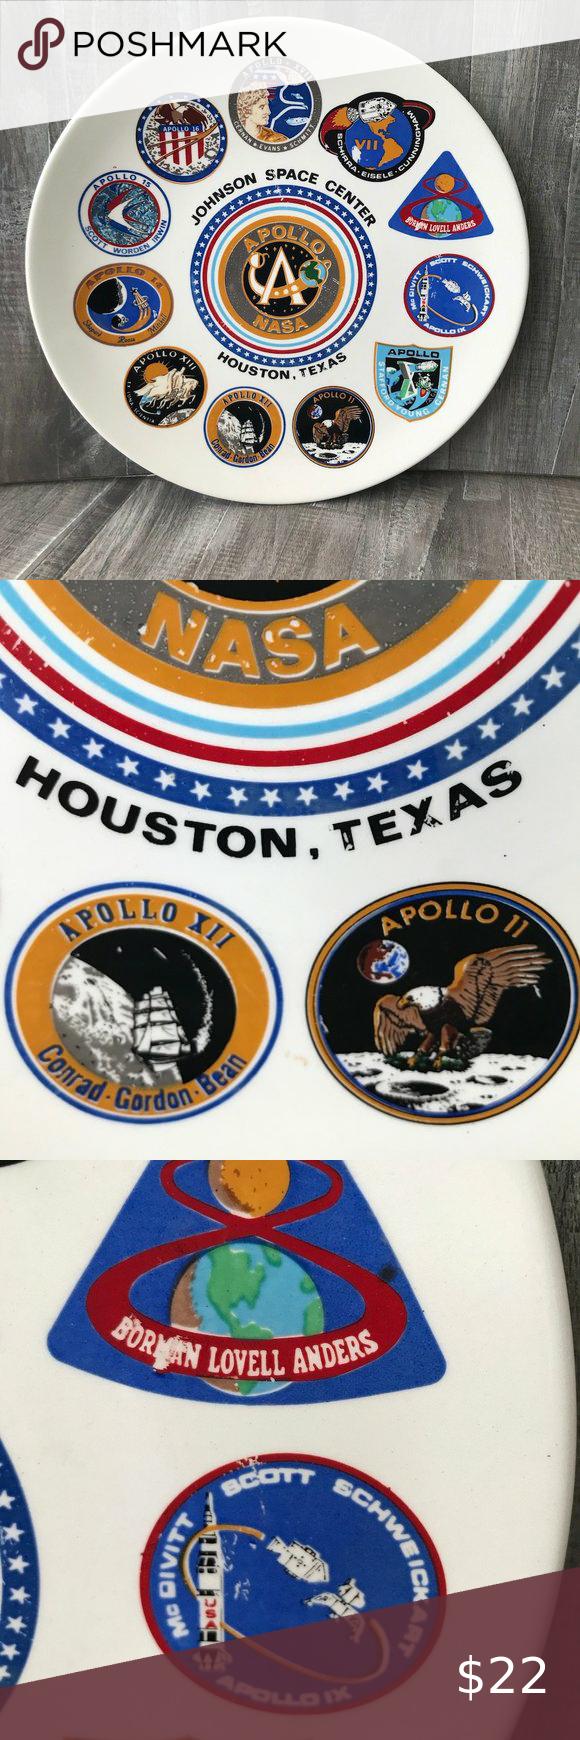 Apollo NASA Johnson Space Center Vintage Plate 🚀 in 2020